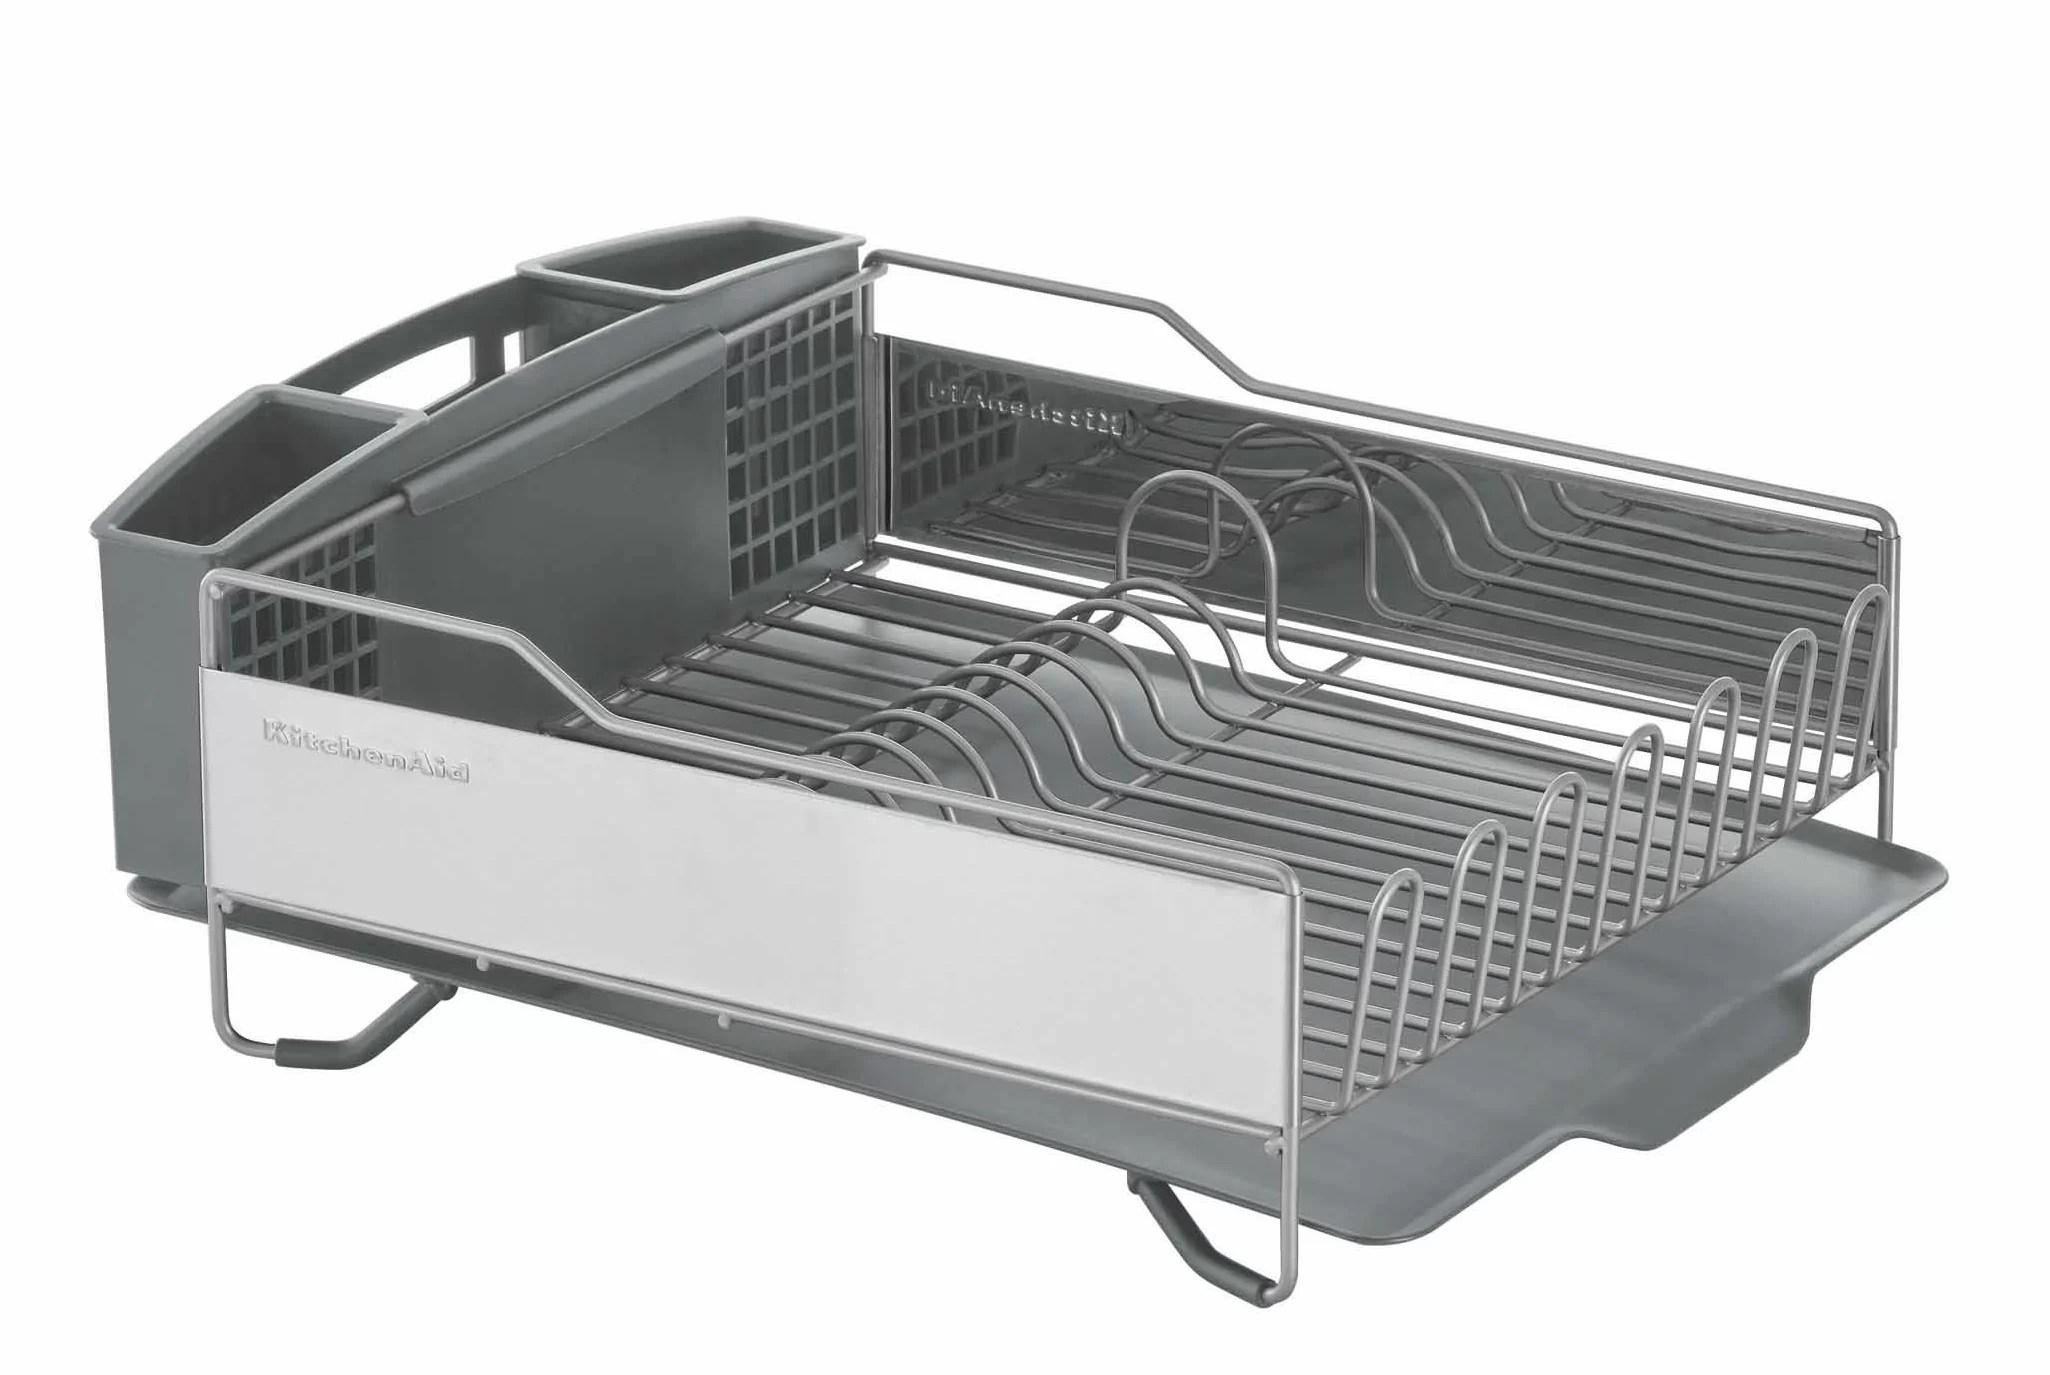 stainless steel countertop dish rack